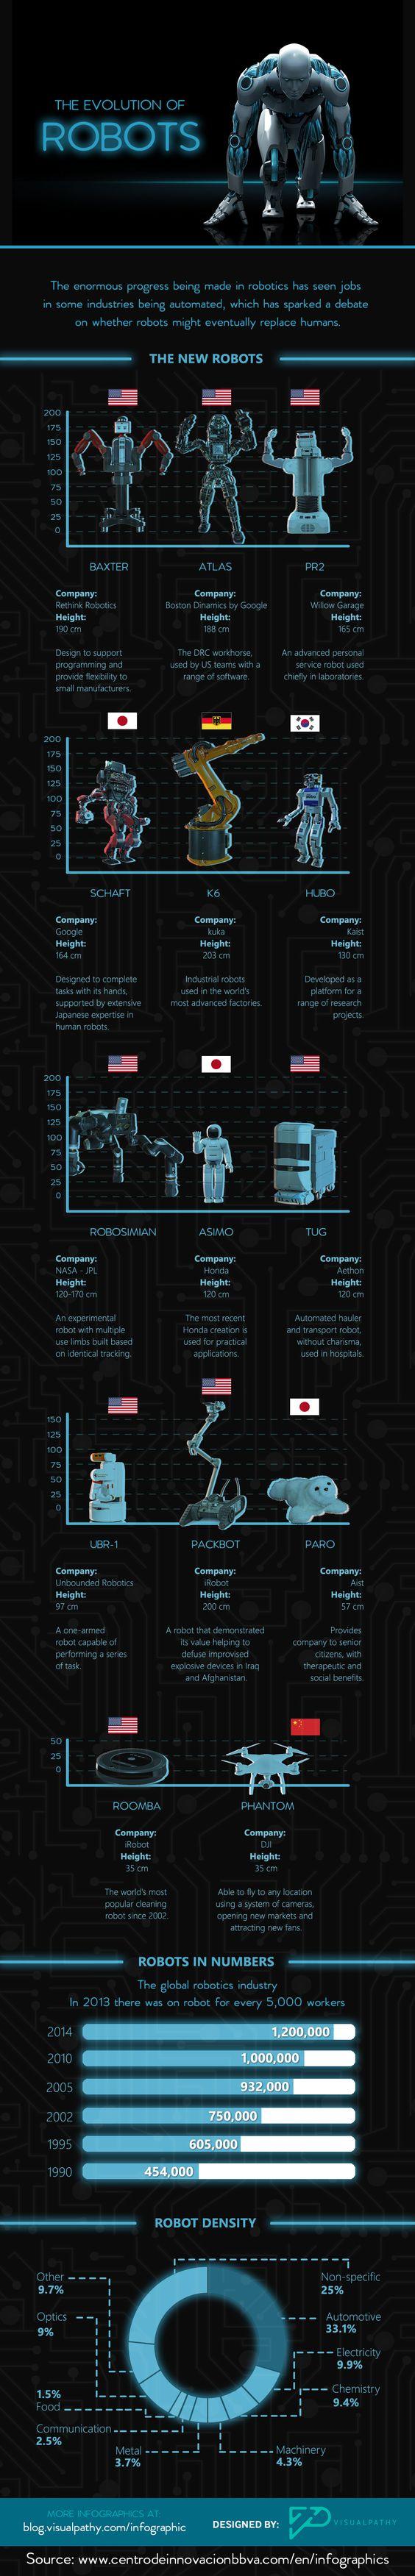 evolution technology of Robots